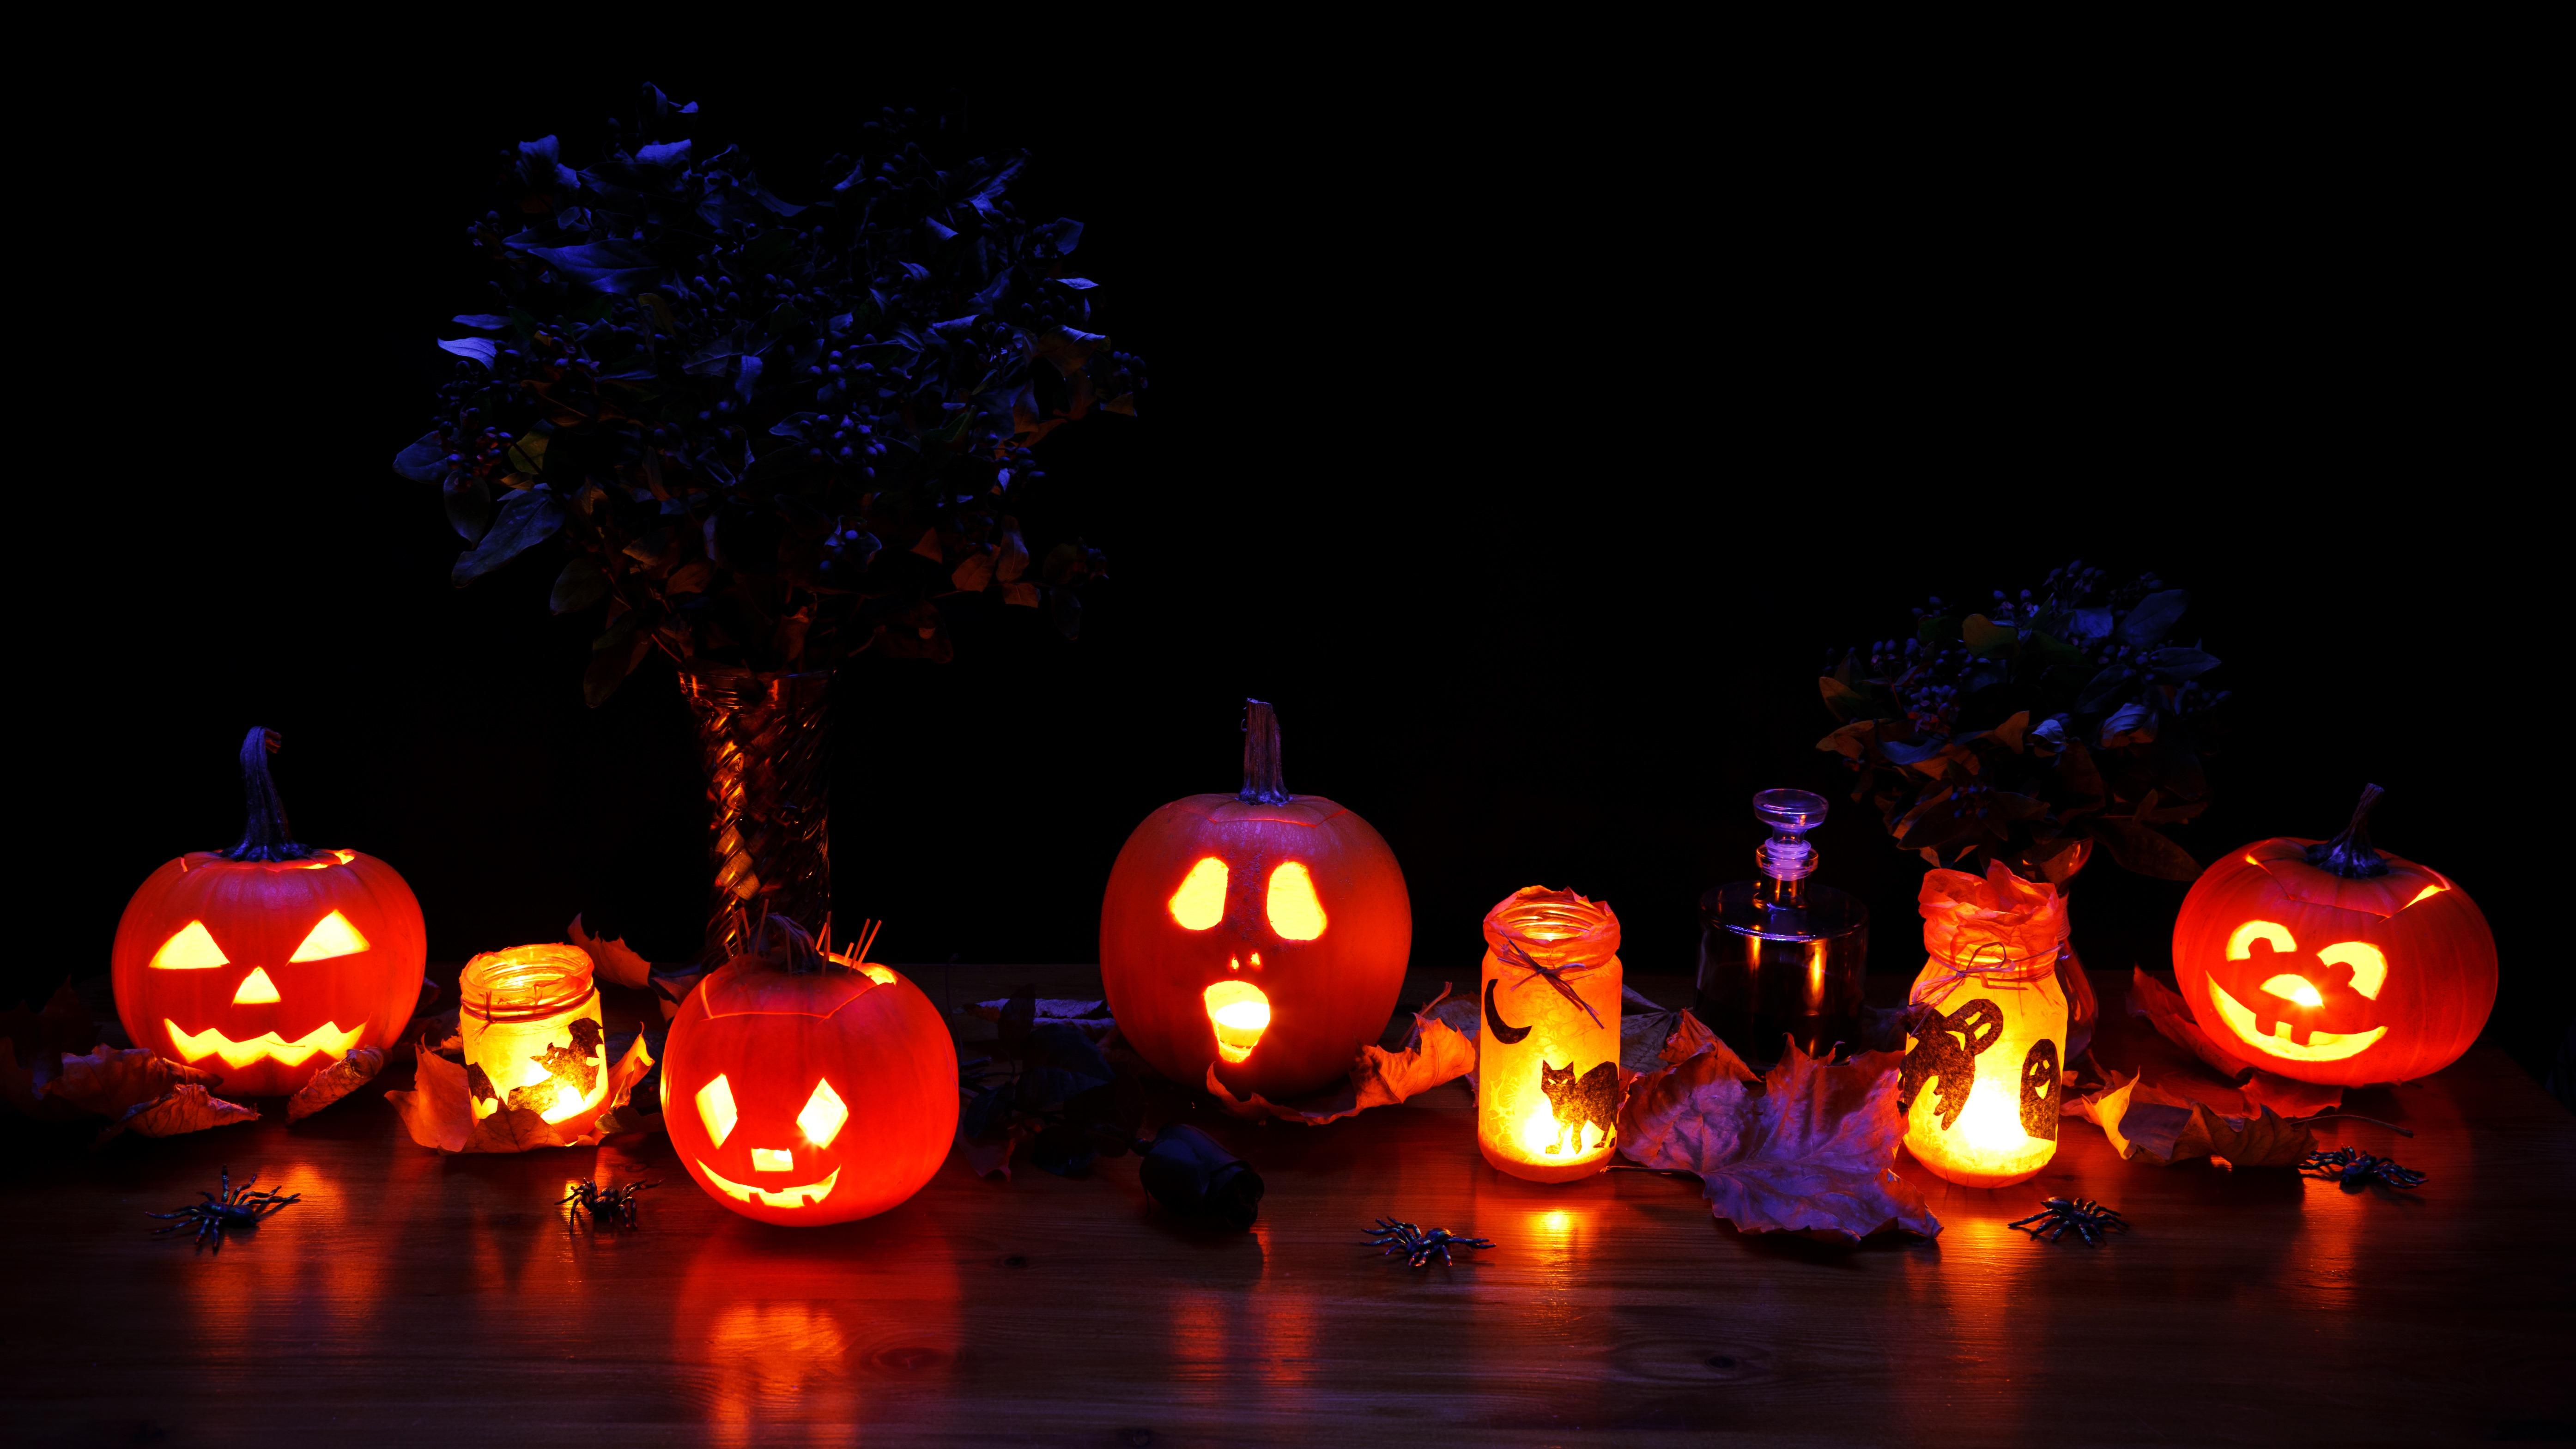 free images glowing fall spooky dark orange pumpkin. Black Bedroom Furniture Sets. Home Design Ideas